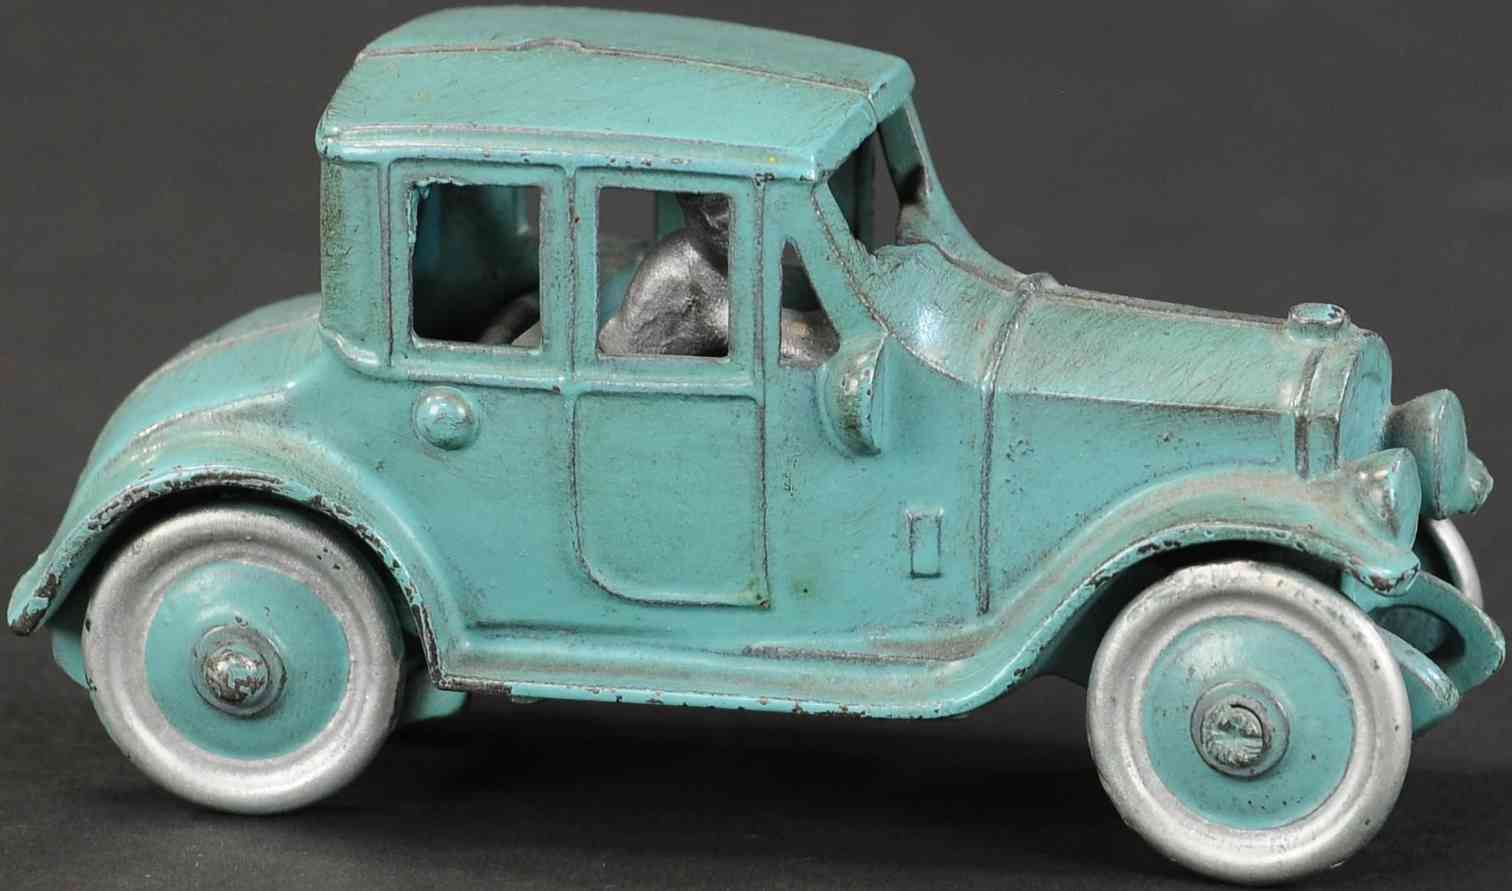 kenton hardware co blue cast iron toy car salesman sample coupe blue